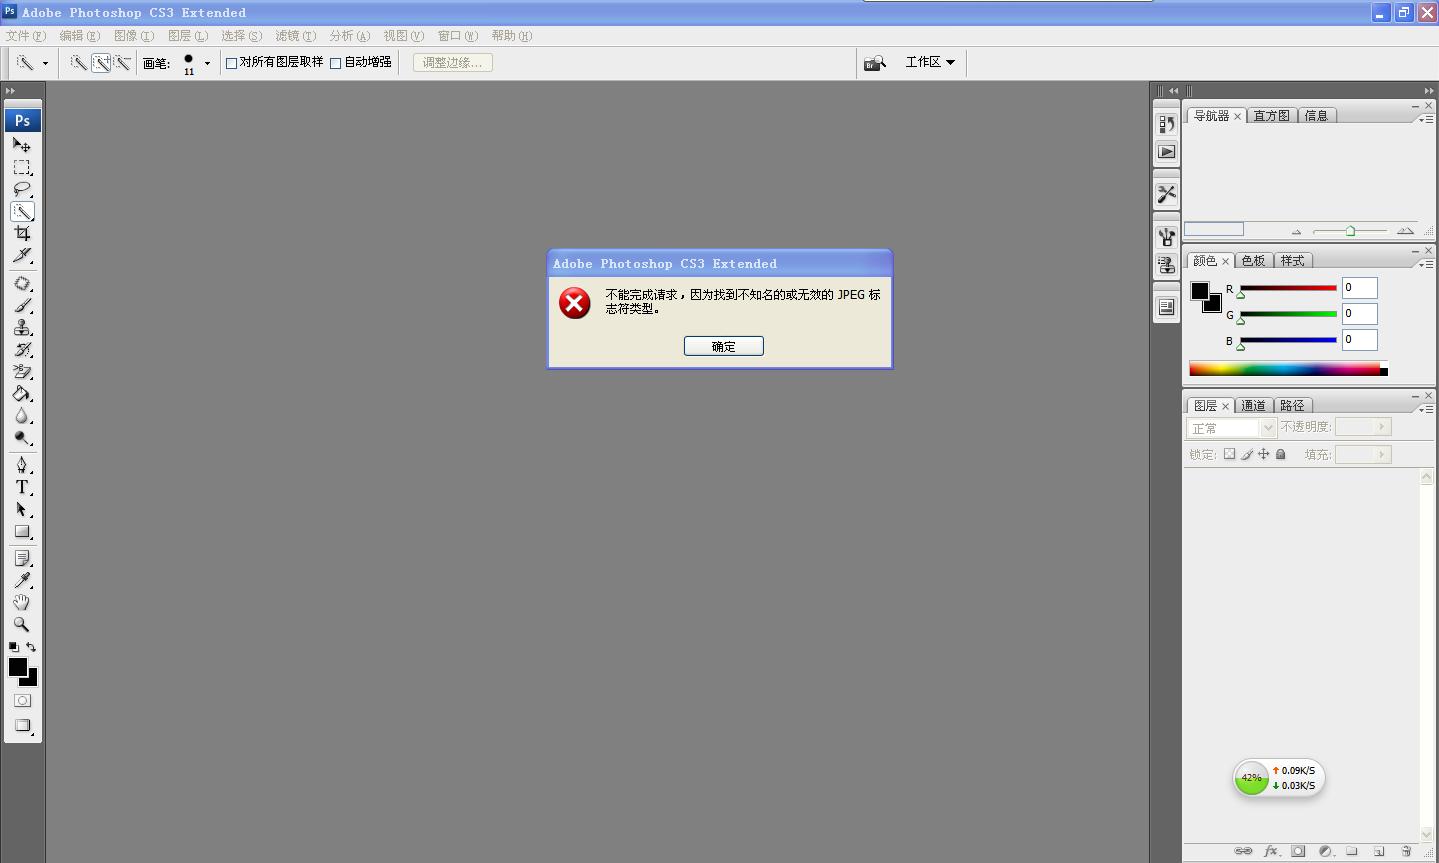 jpg图像保存后ps显示无效是怎么回事?图片